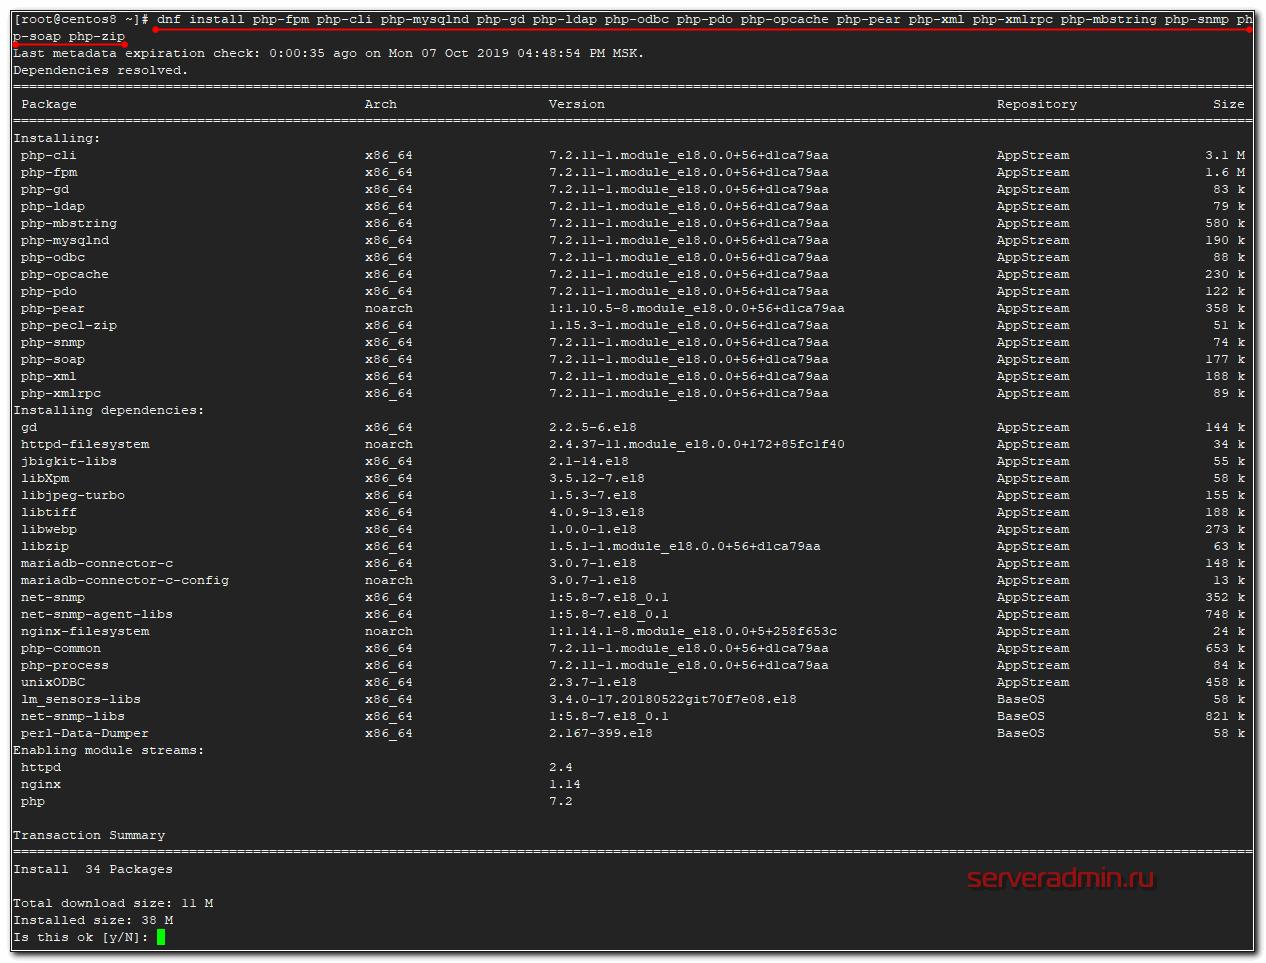 Установка php 7.2